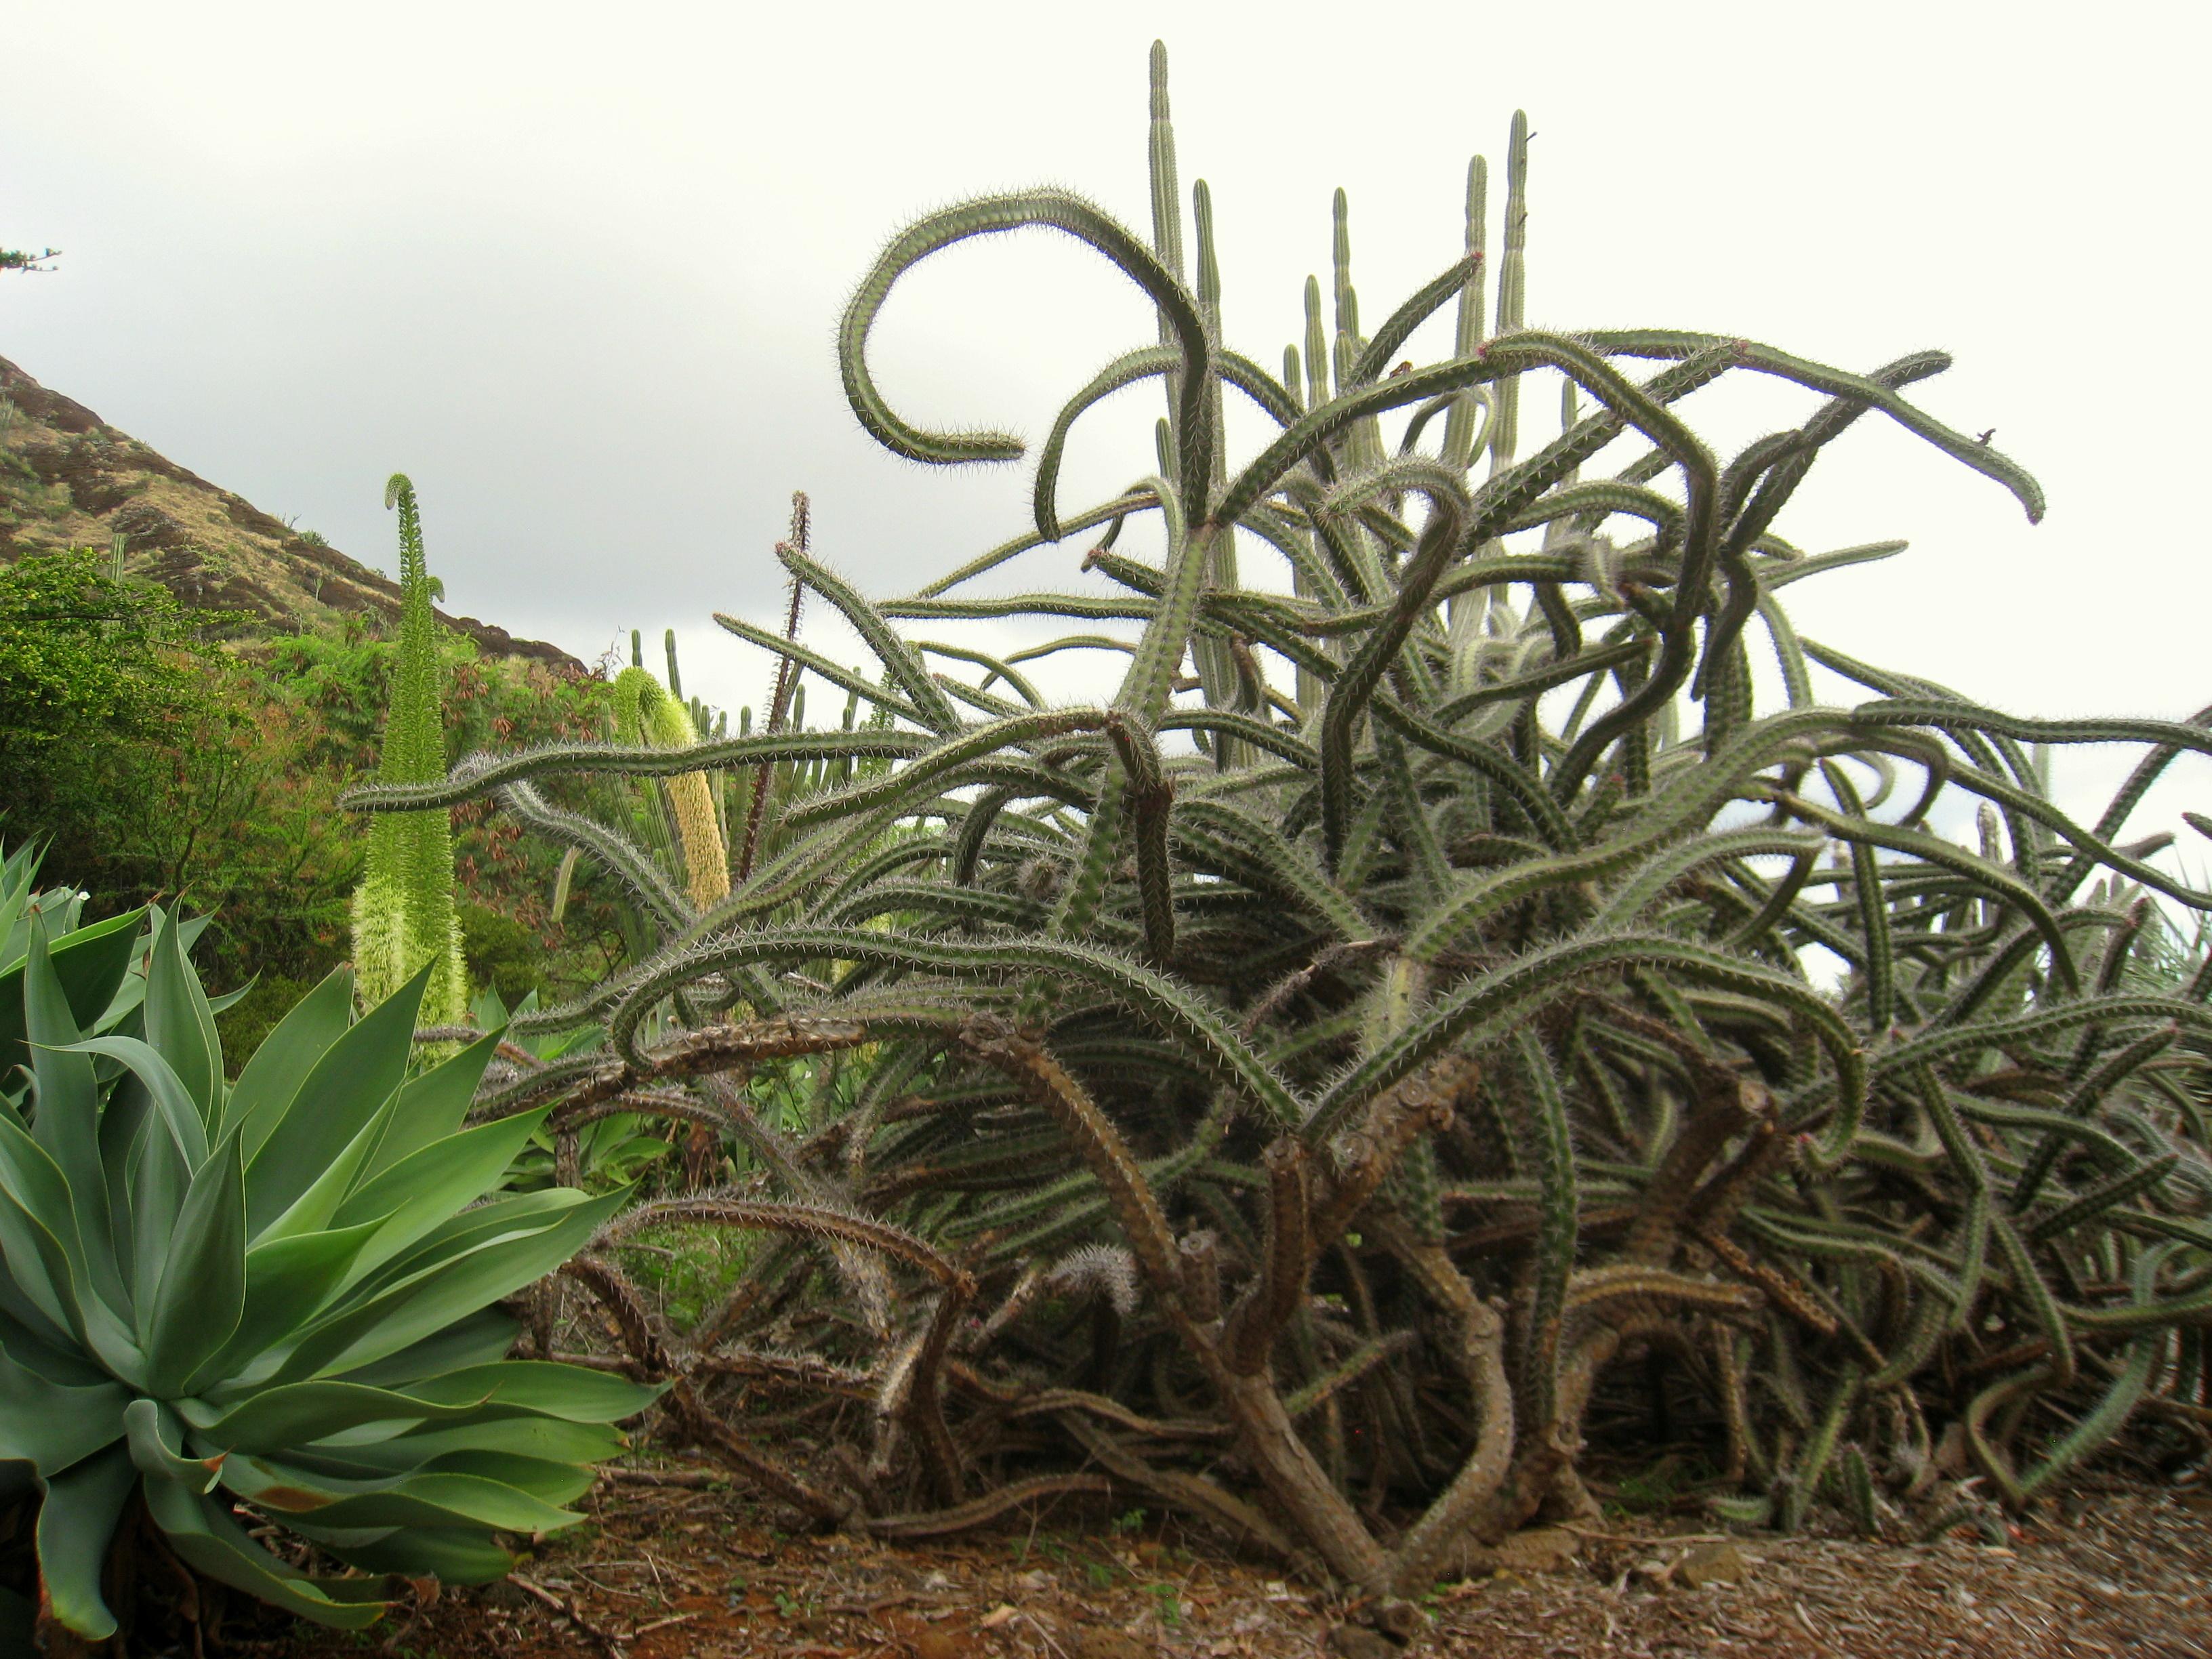 File Rathbunia Alamosensis Koko Crater Botanical Garden Img 2206 Jpg Wikimedia Commons